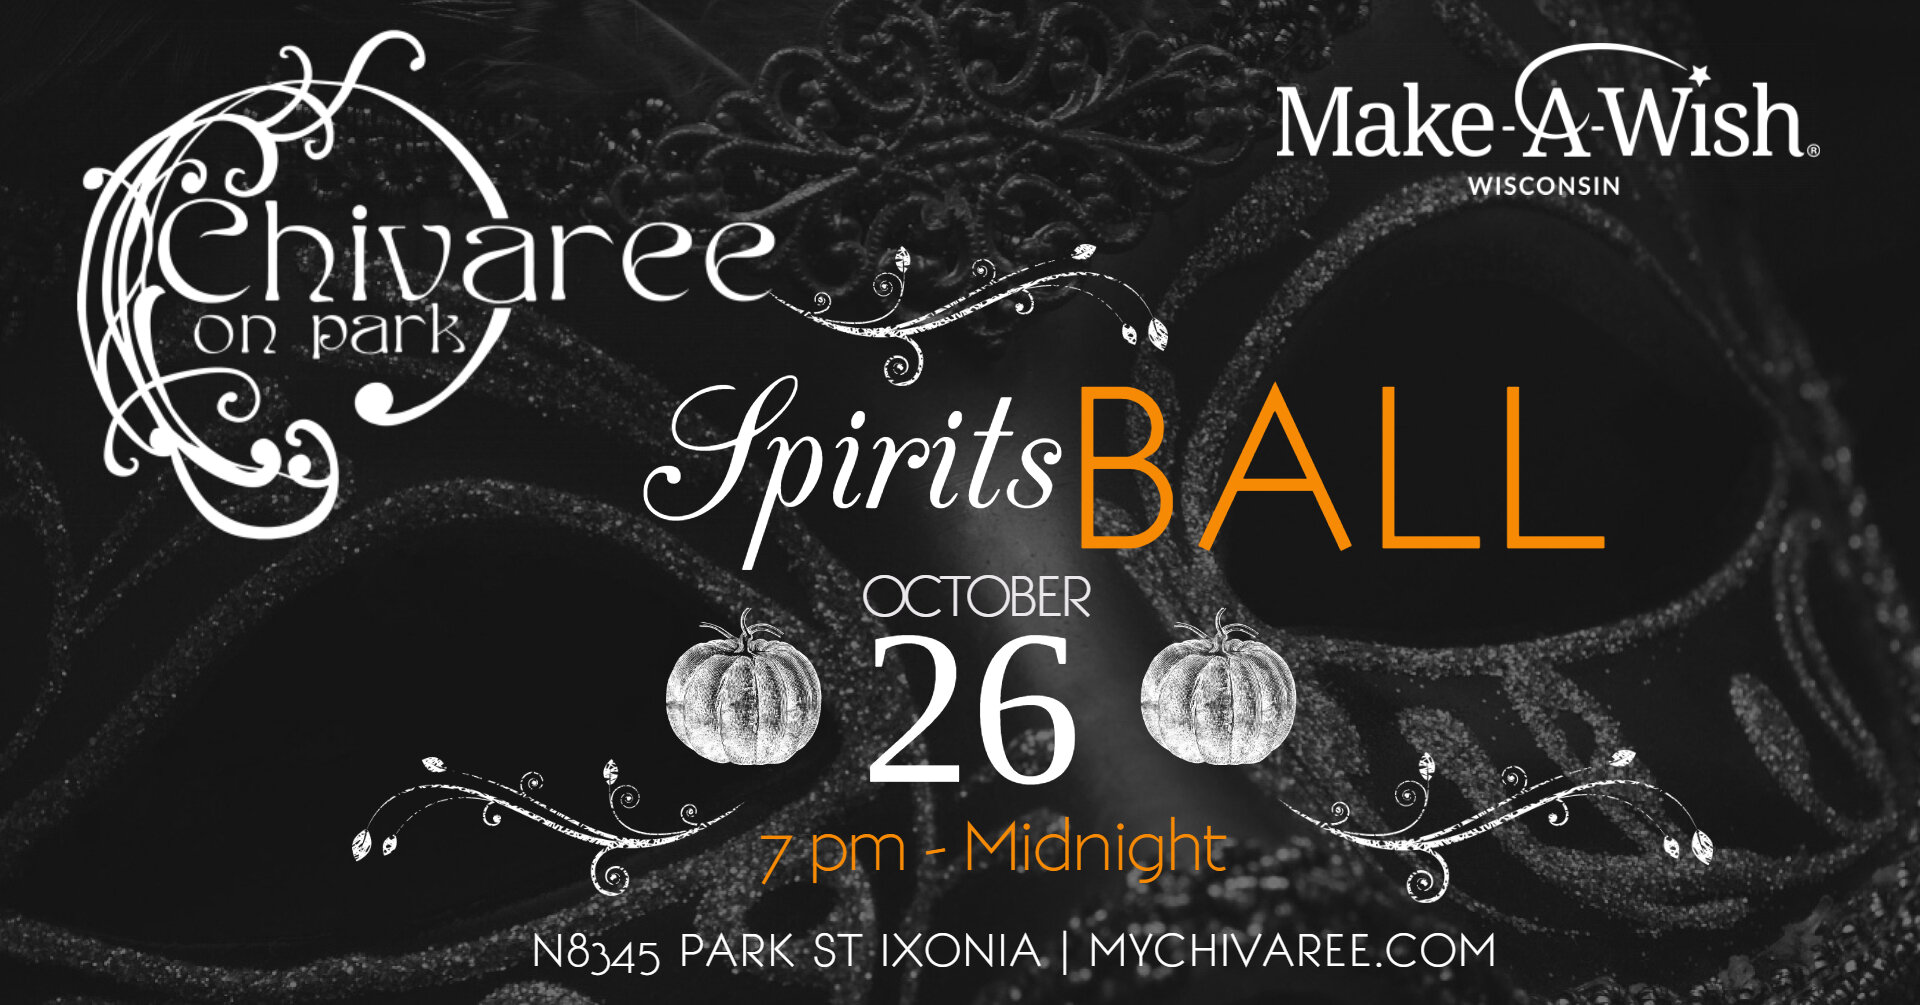 Sprits Ball Event 10 26 2019.jpg